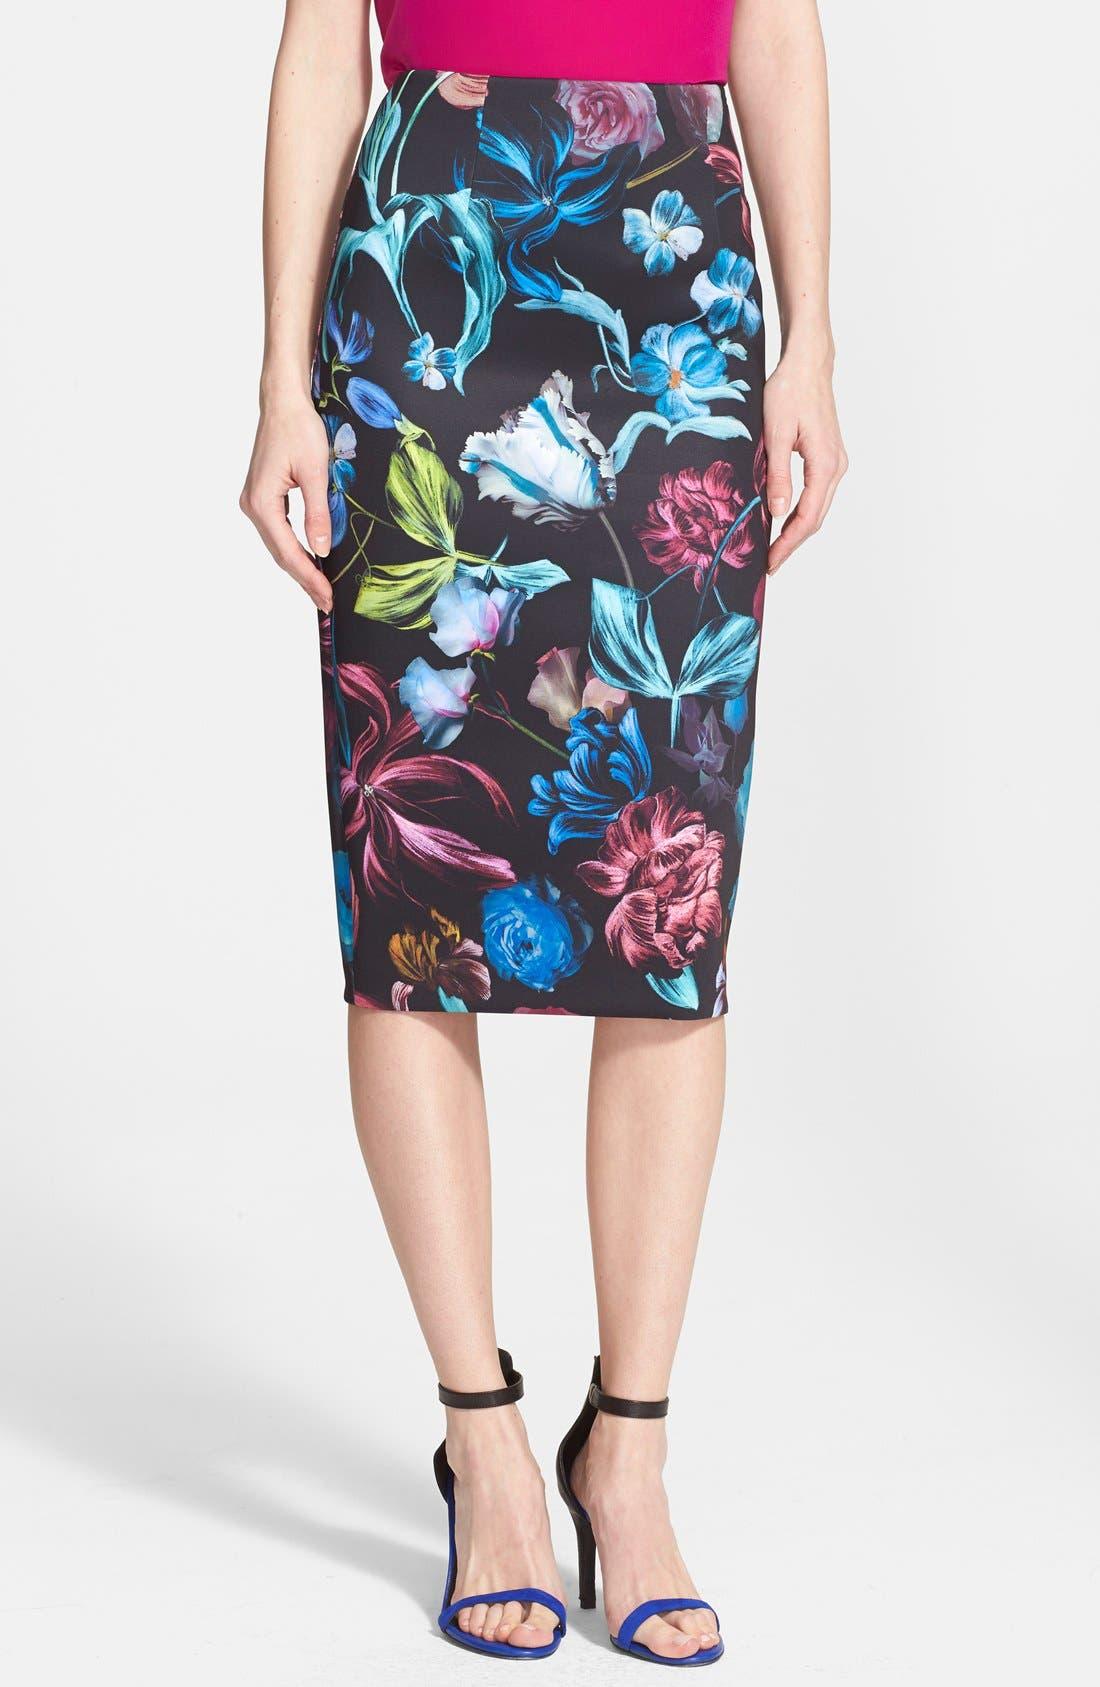 Alternate Image 1 Selected - Ted Baker London 'Dabah' Floral Print Pencil Skirt